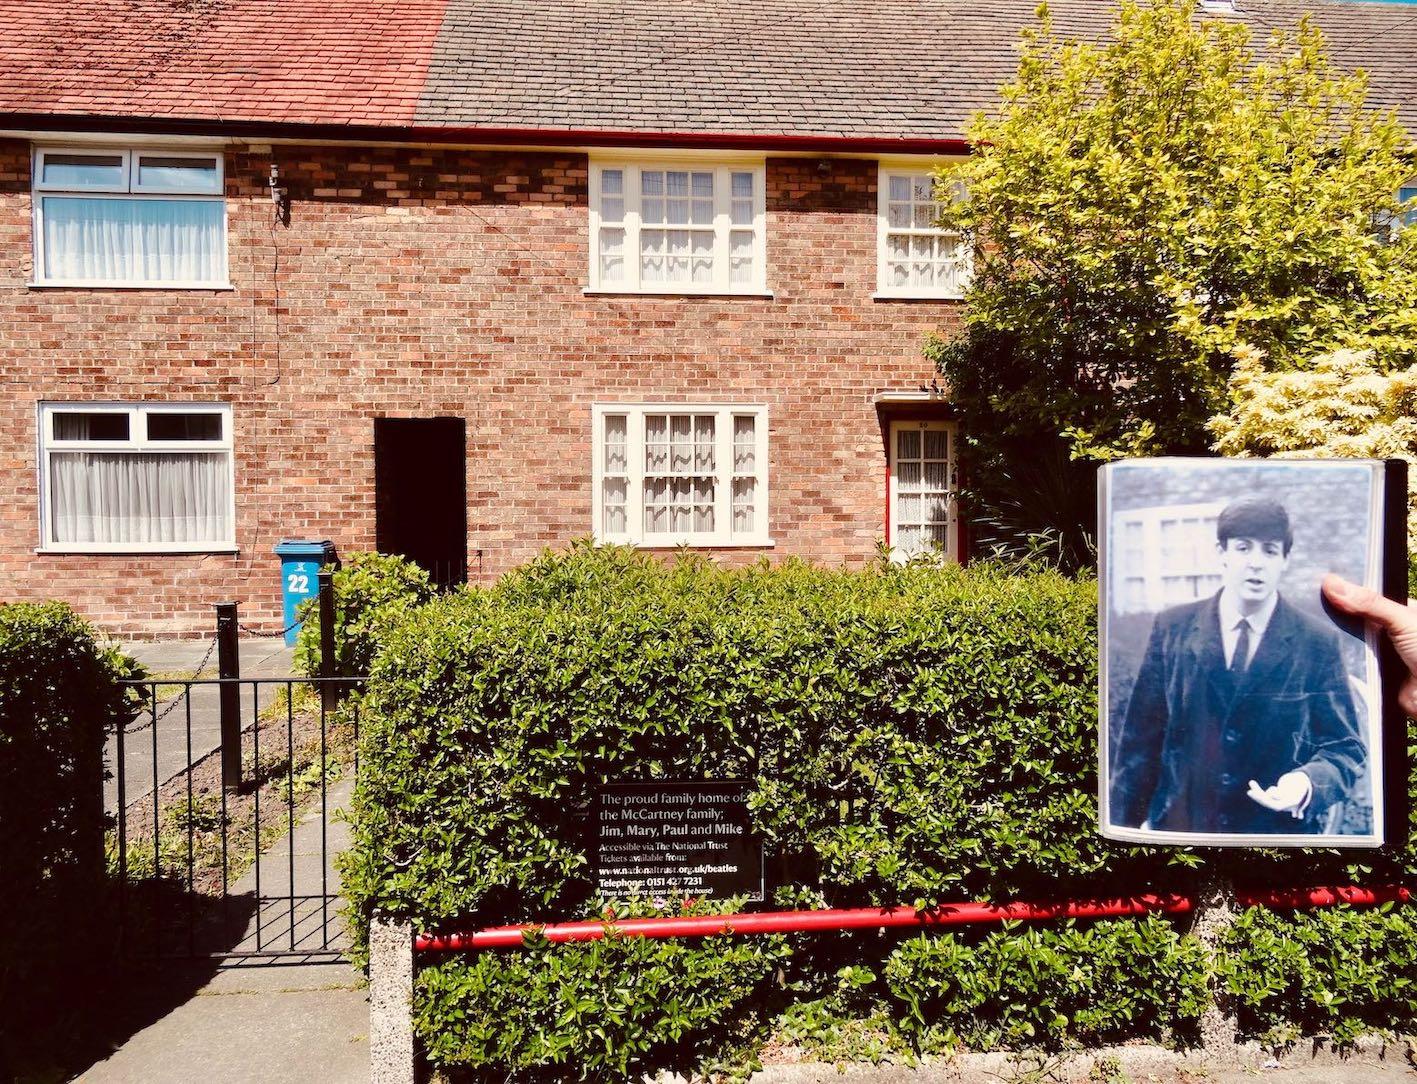 Paul McCartney's childhood home in Liverpool